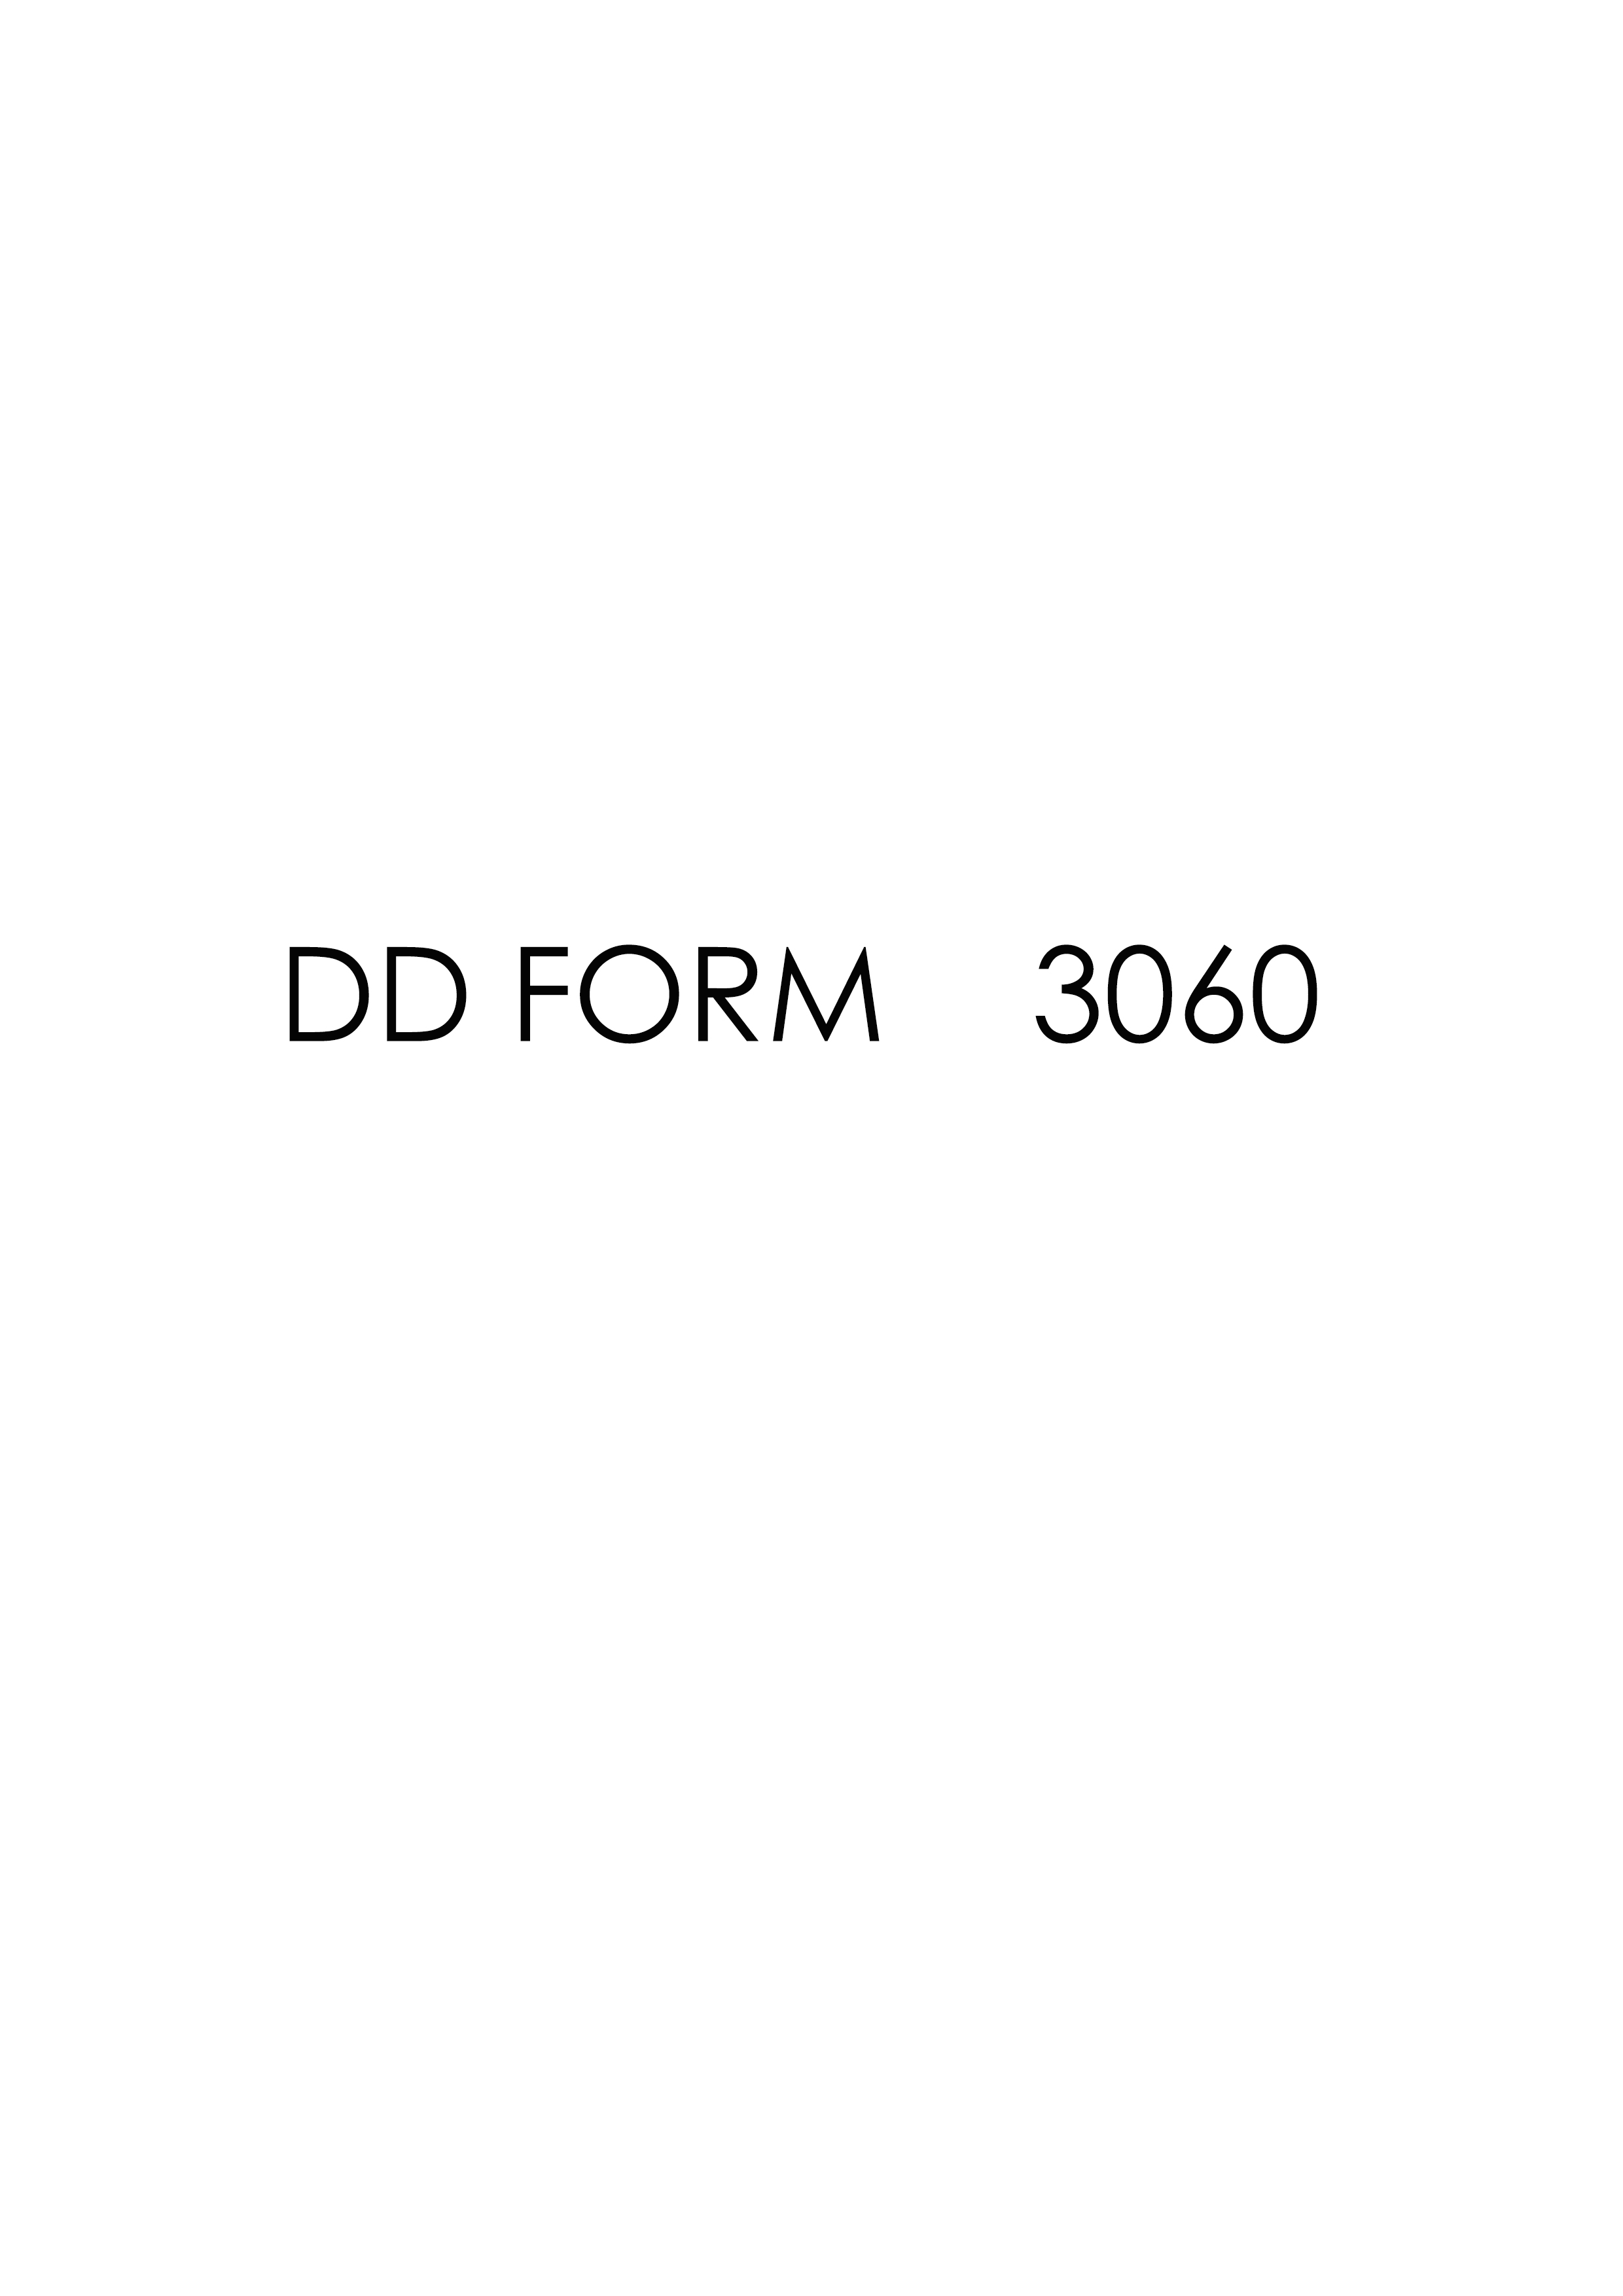 Download dd Form 3060 Free